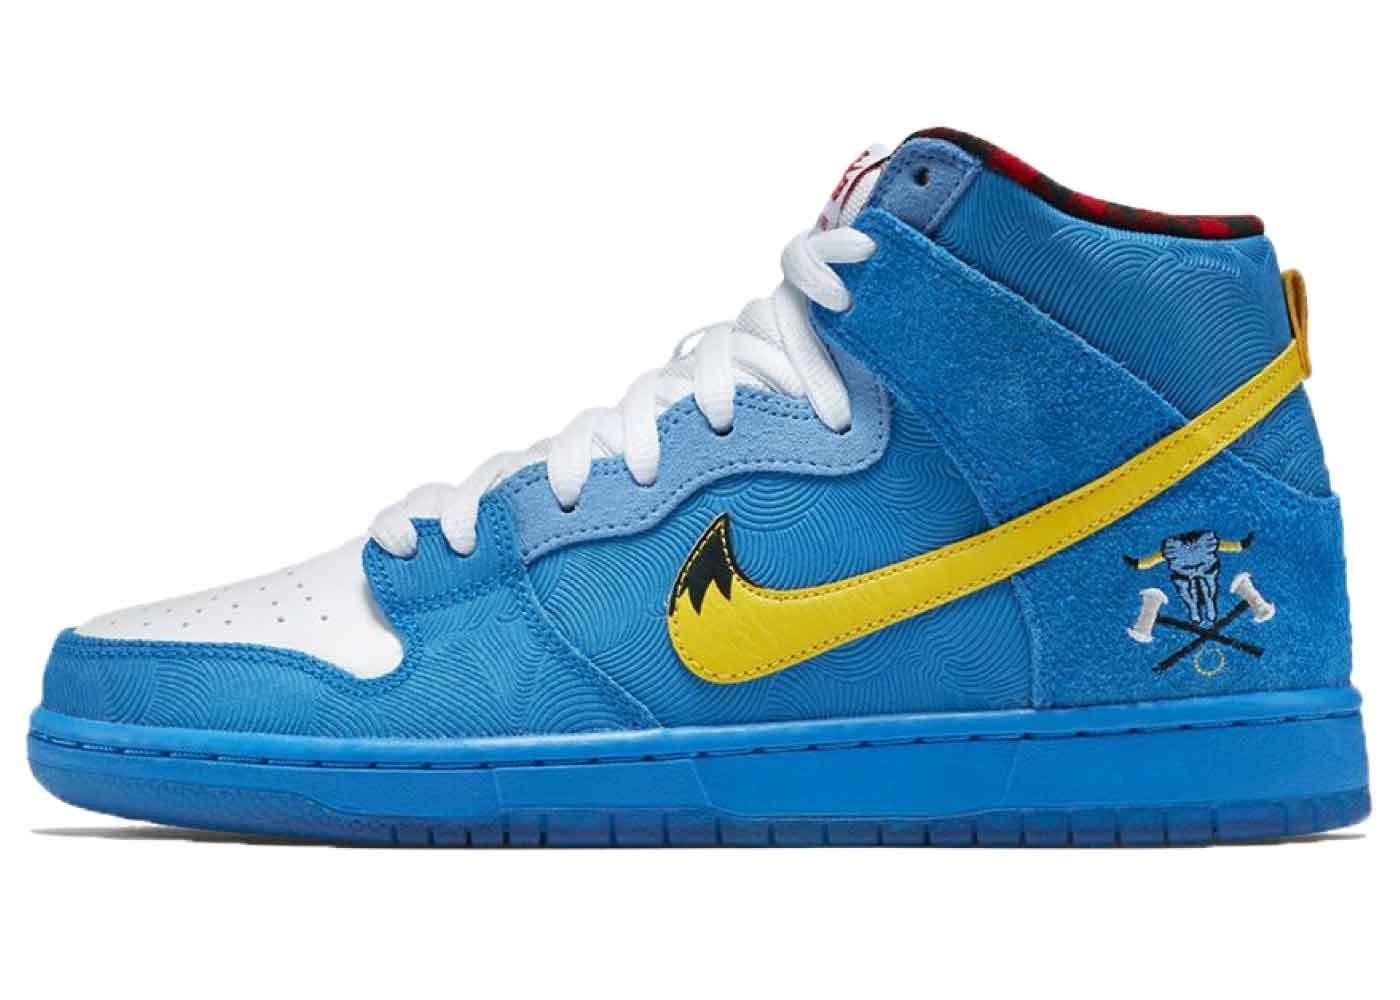 Nike SB Dunk High Familia Blue Oxの写真